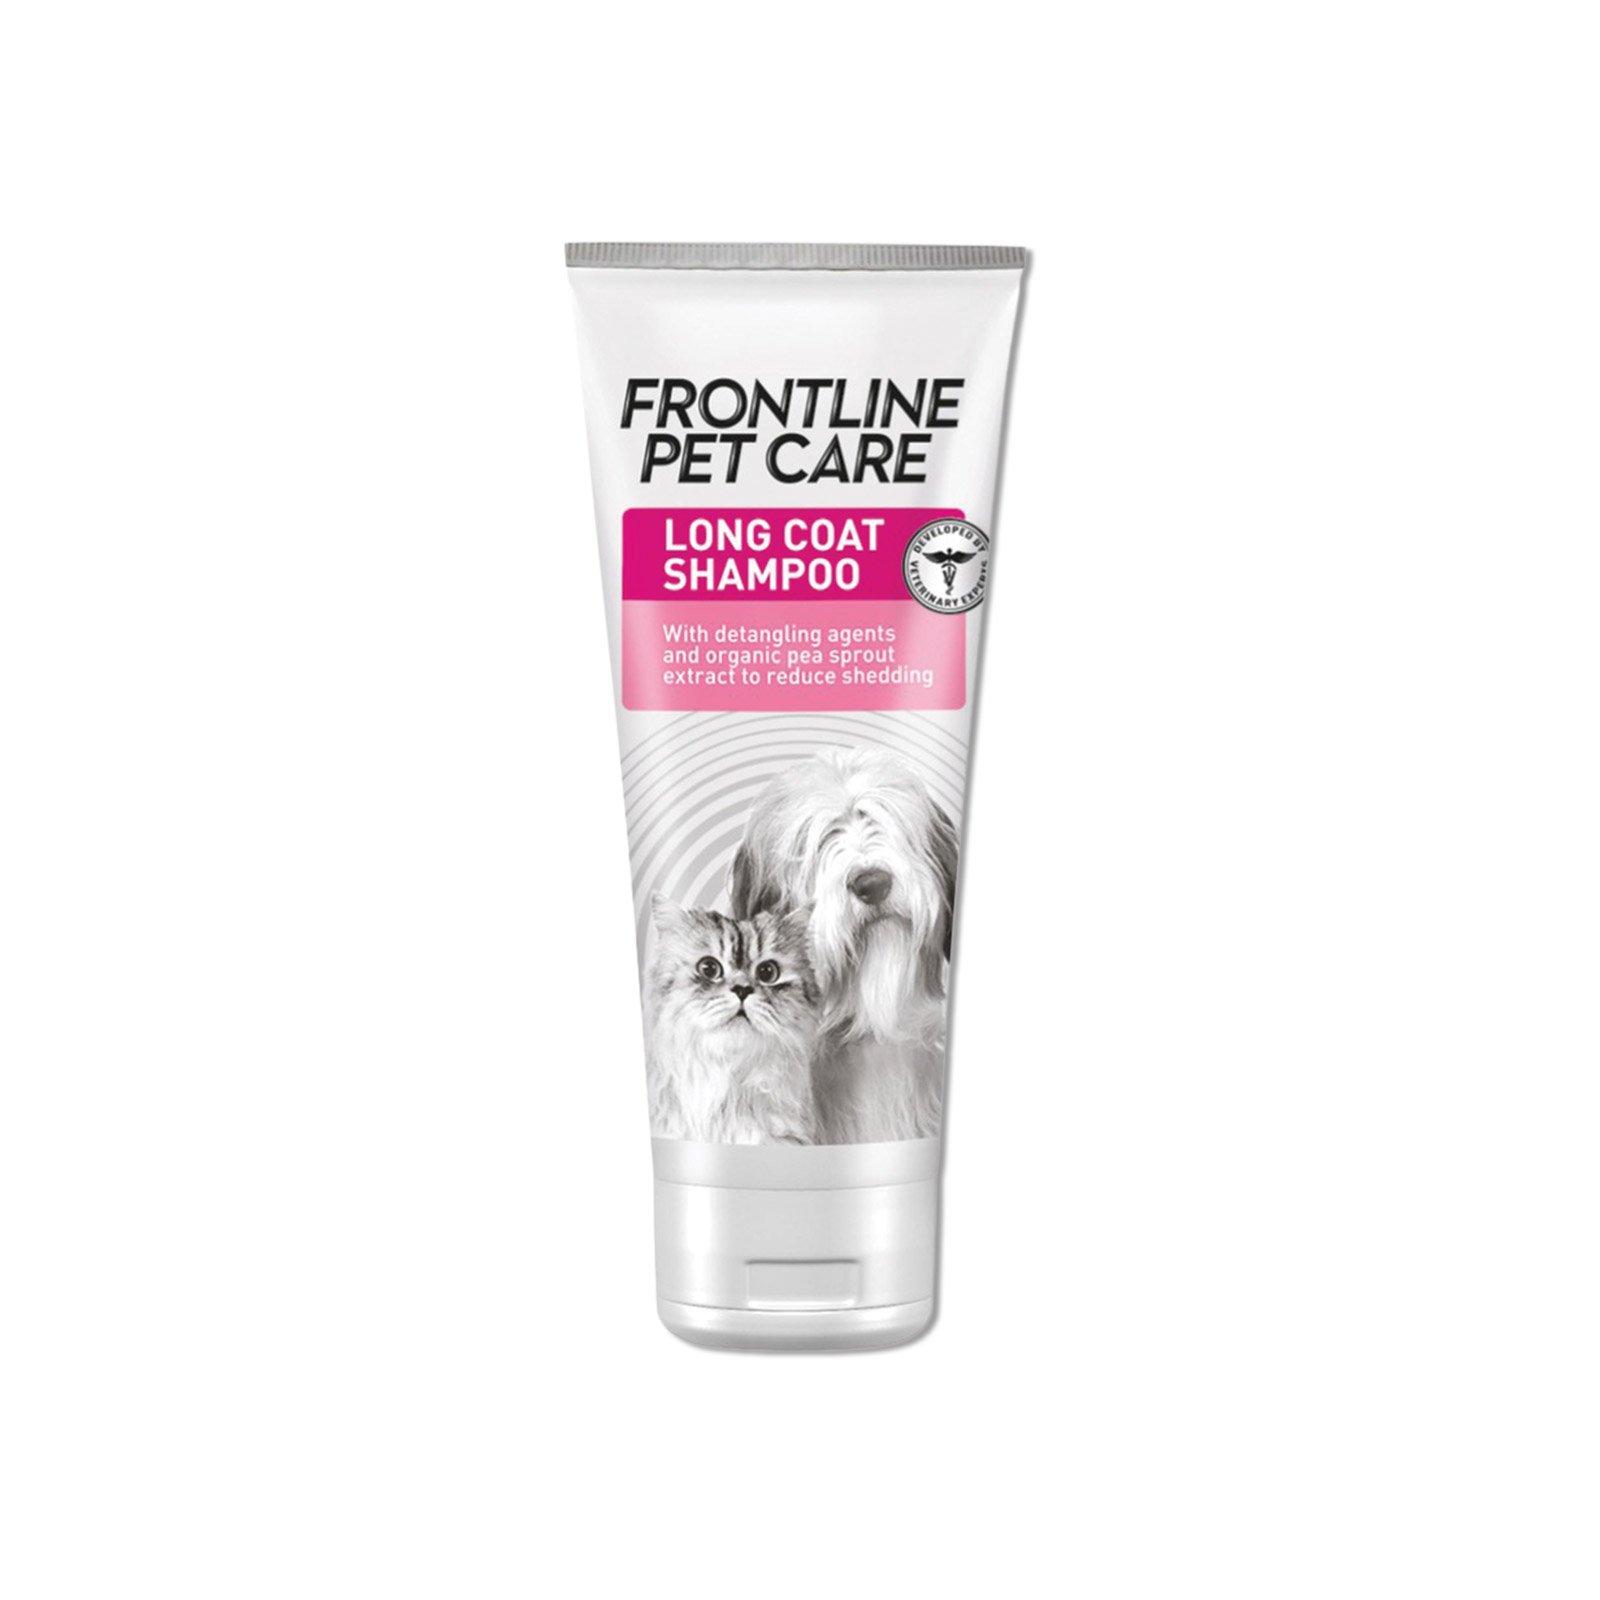 Frontline Pet Care Long Coat Shampoo